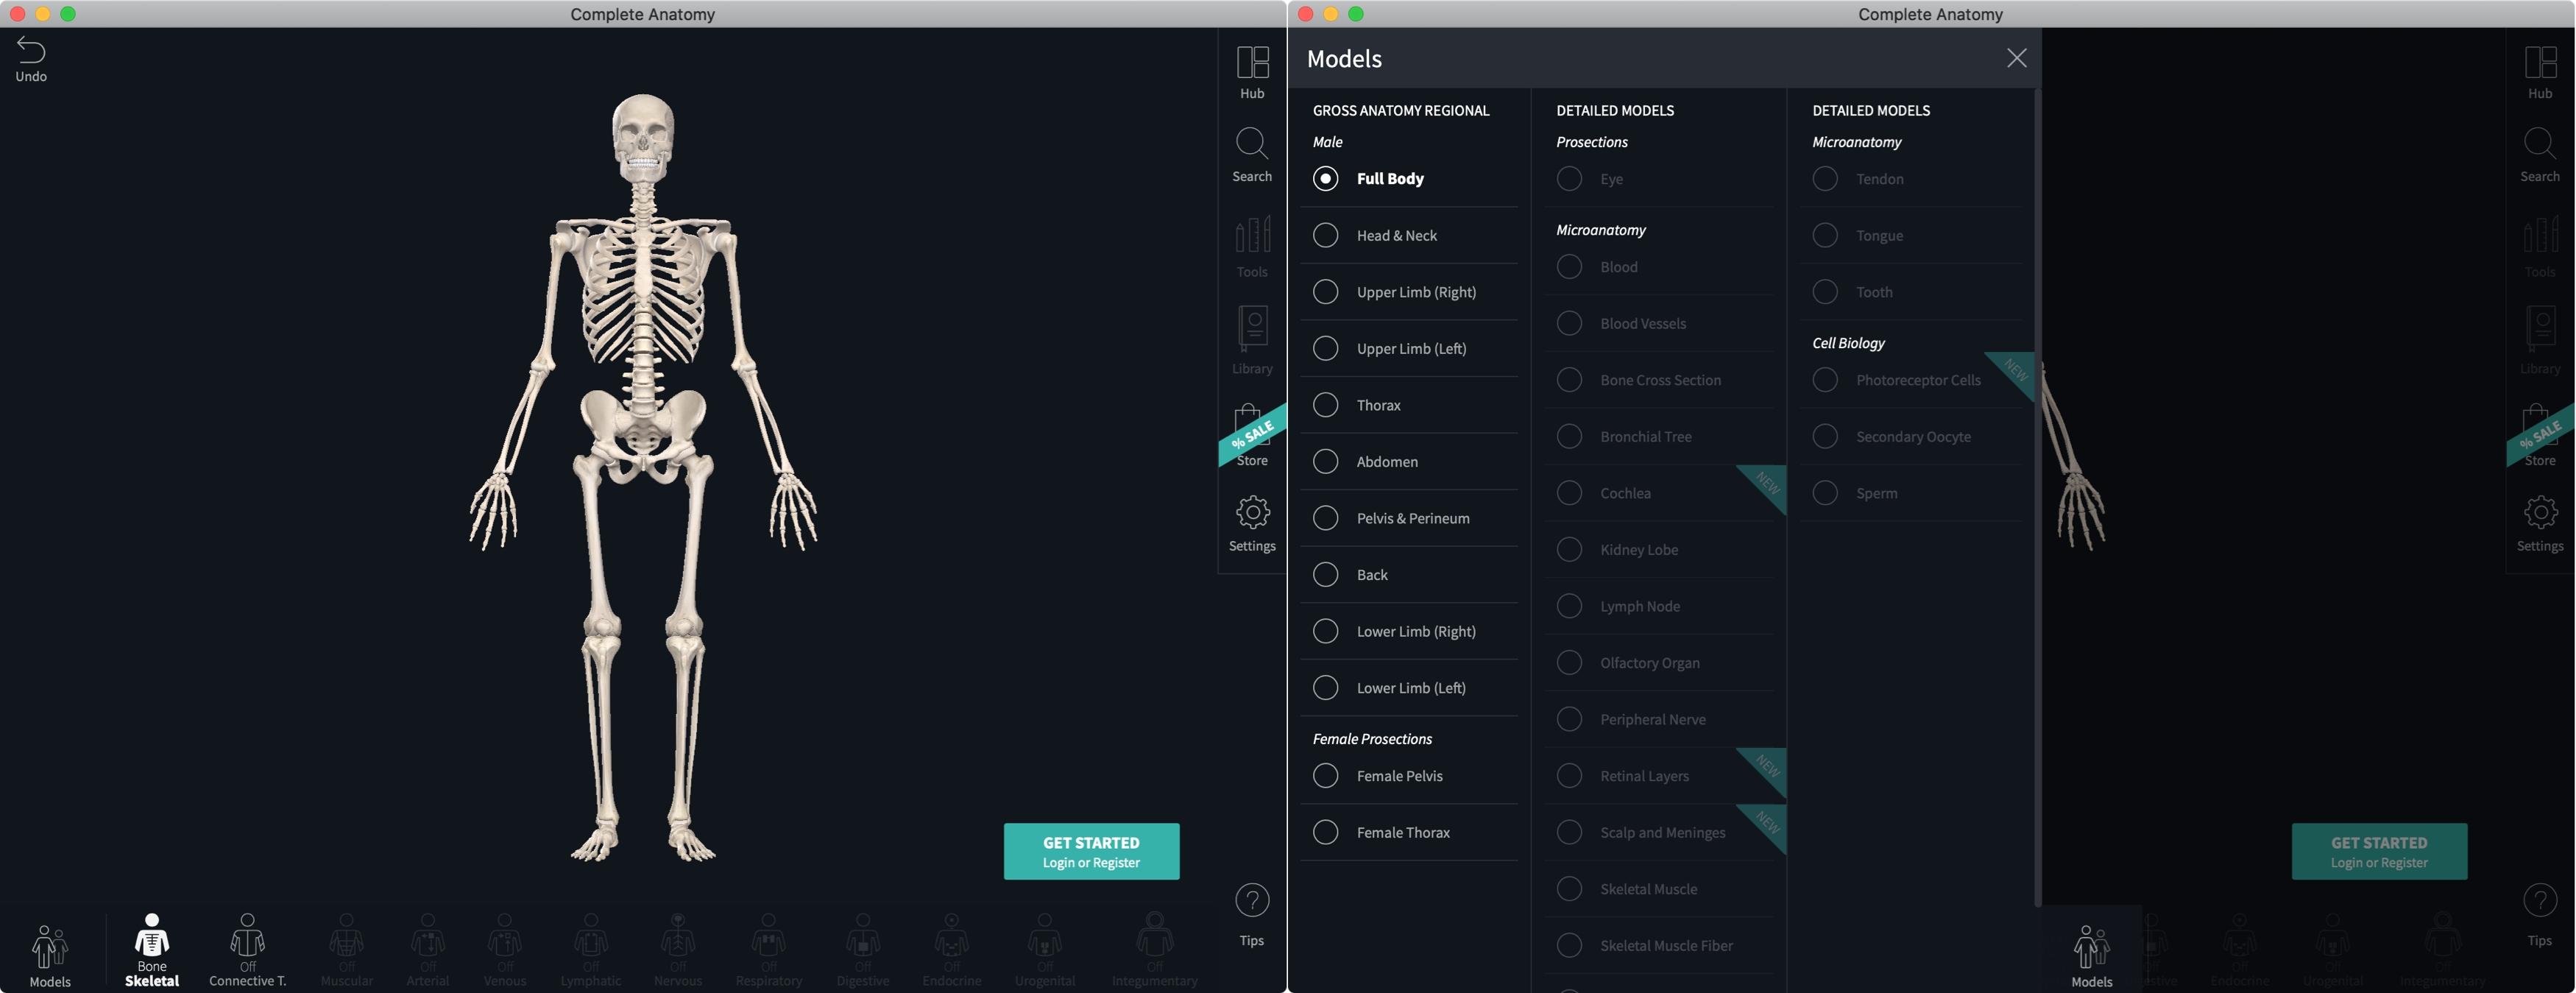 Complete Anatomy 21 Mac App